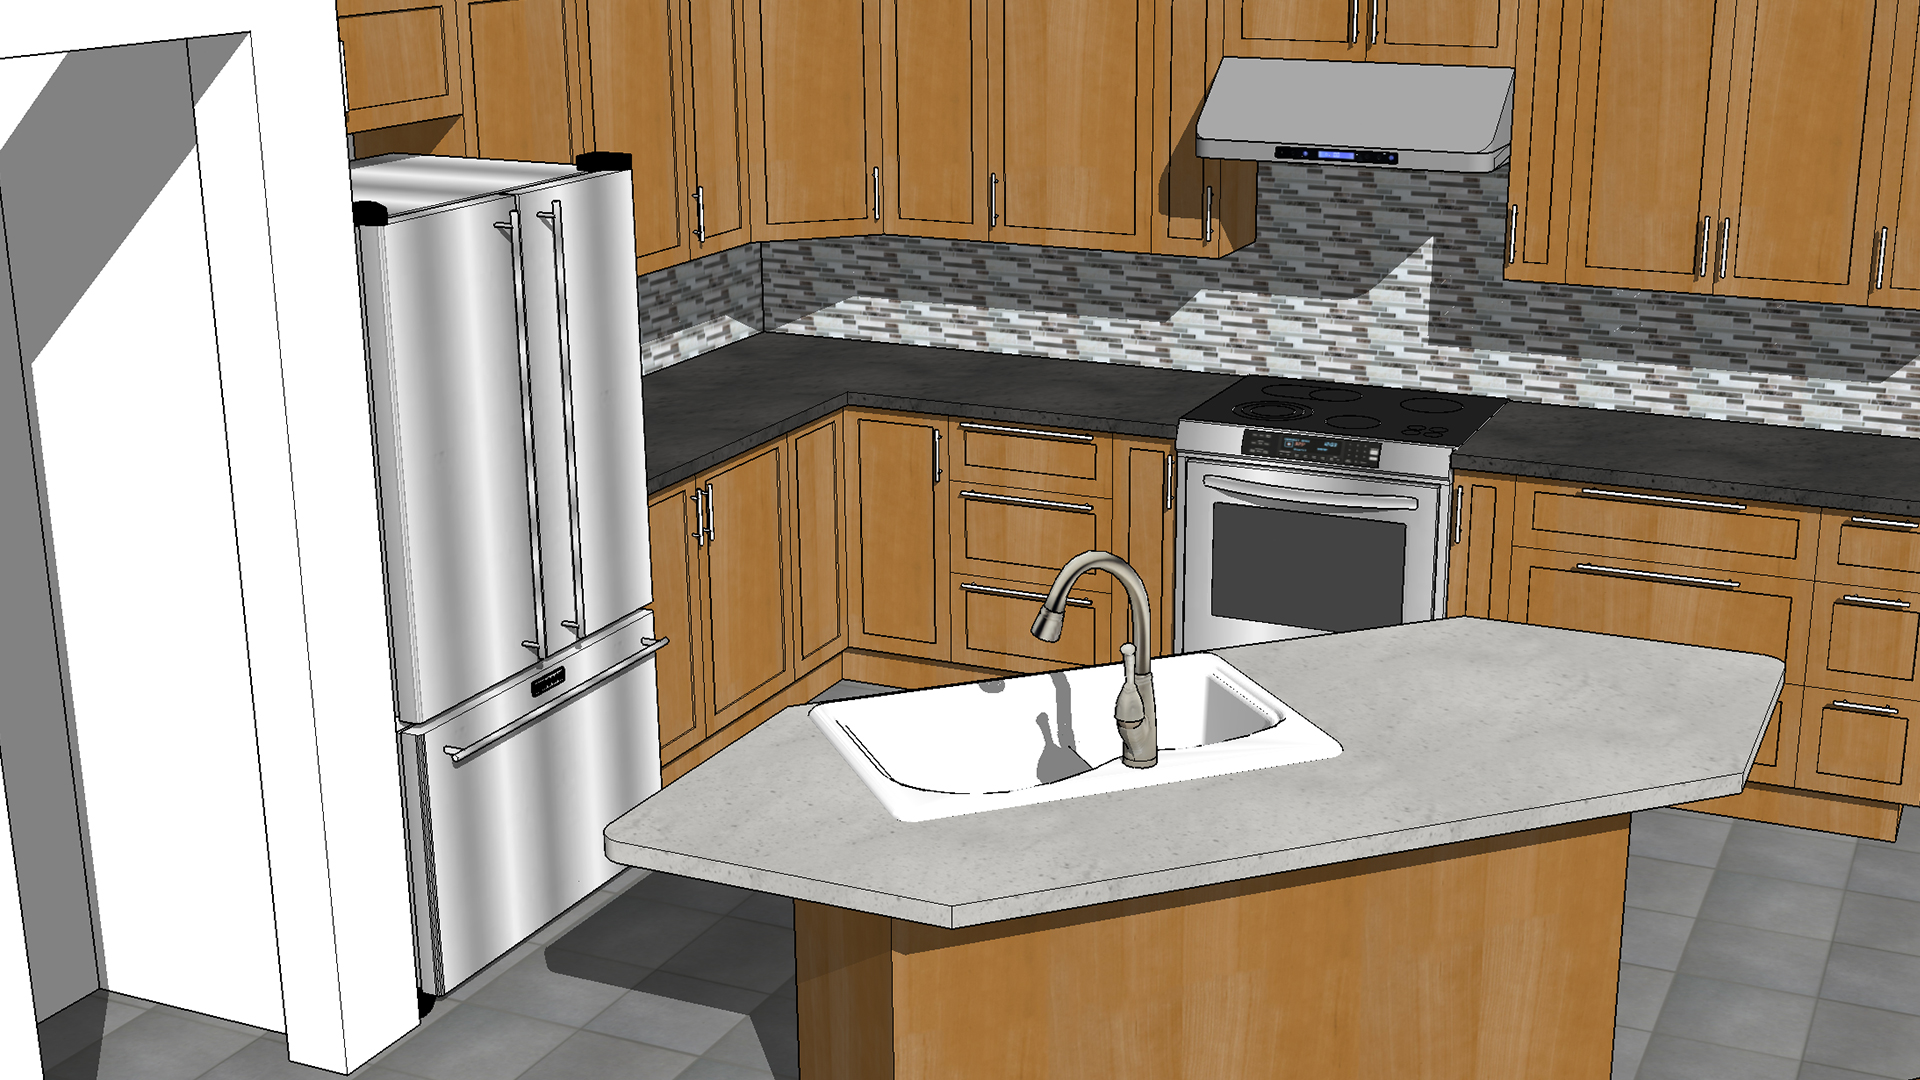 SketchUp: Kitchen Design